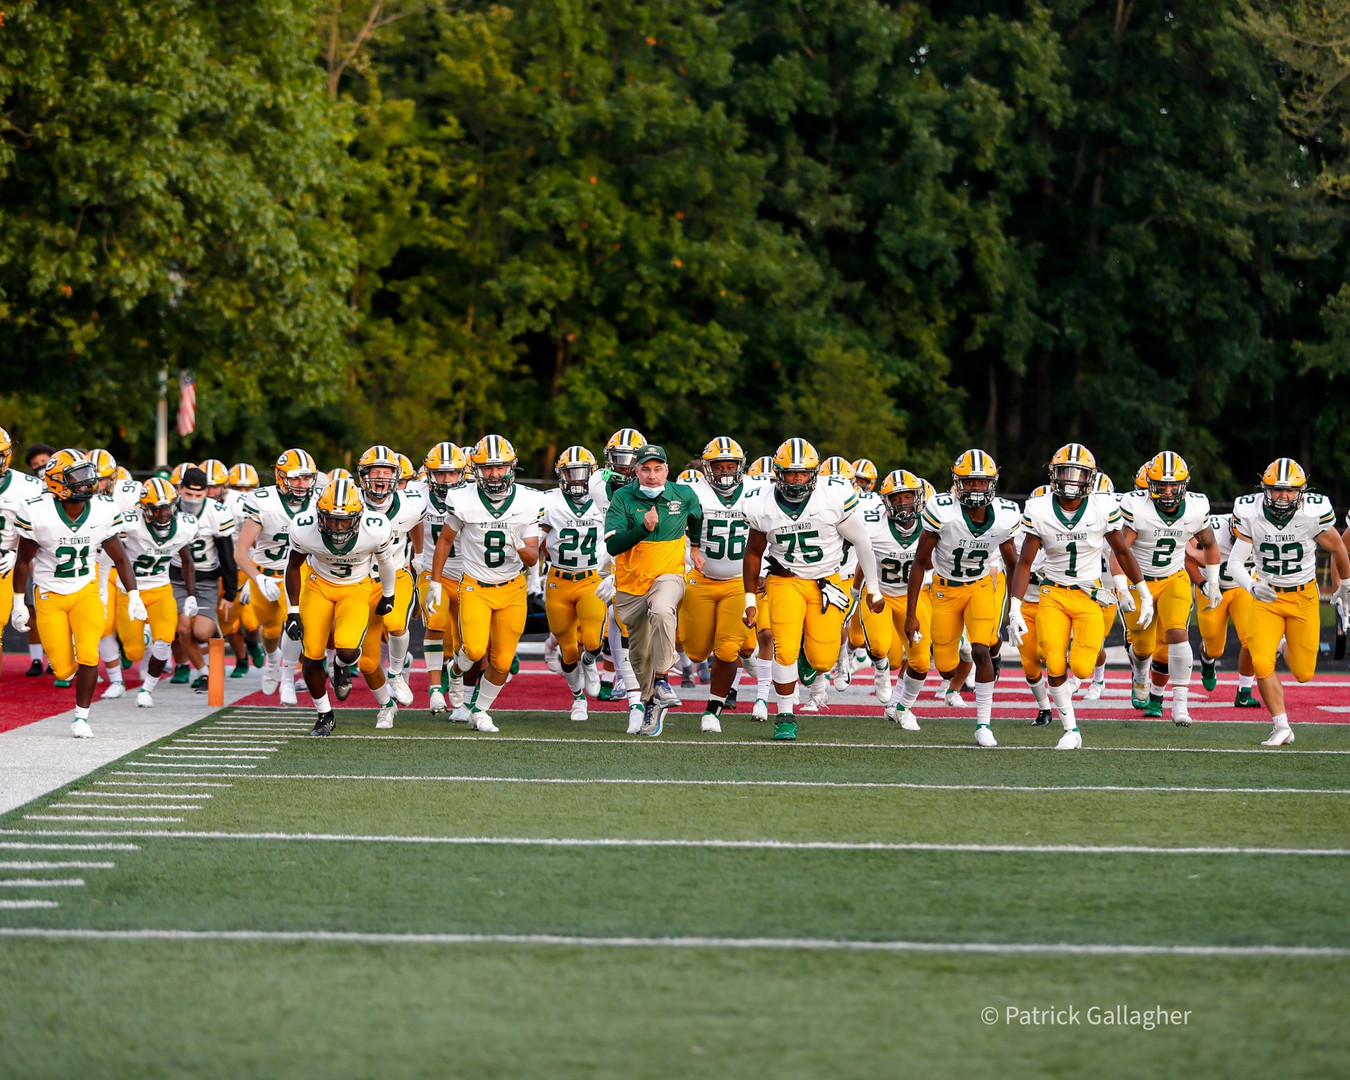 team taking the field.jpg